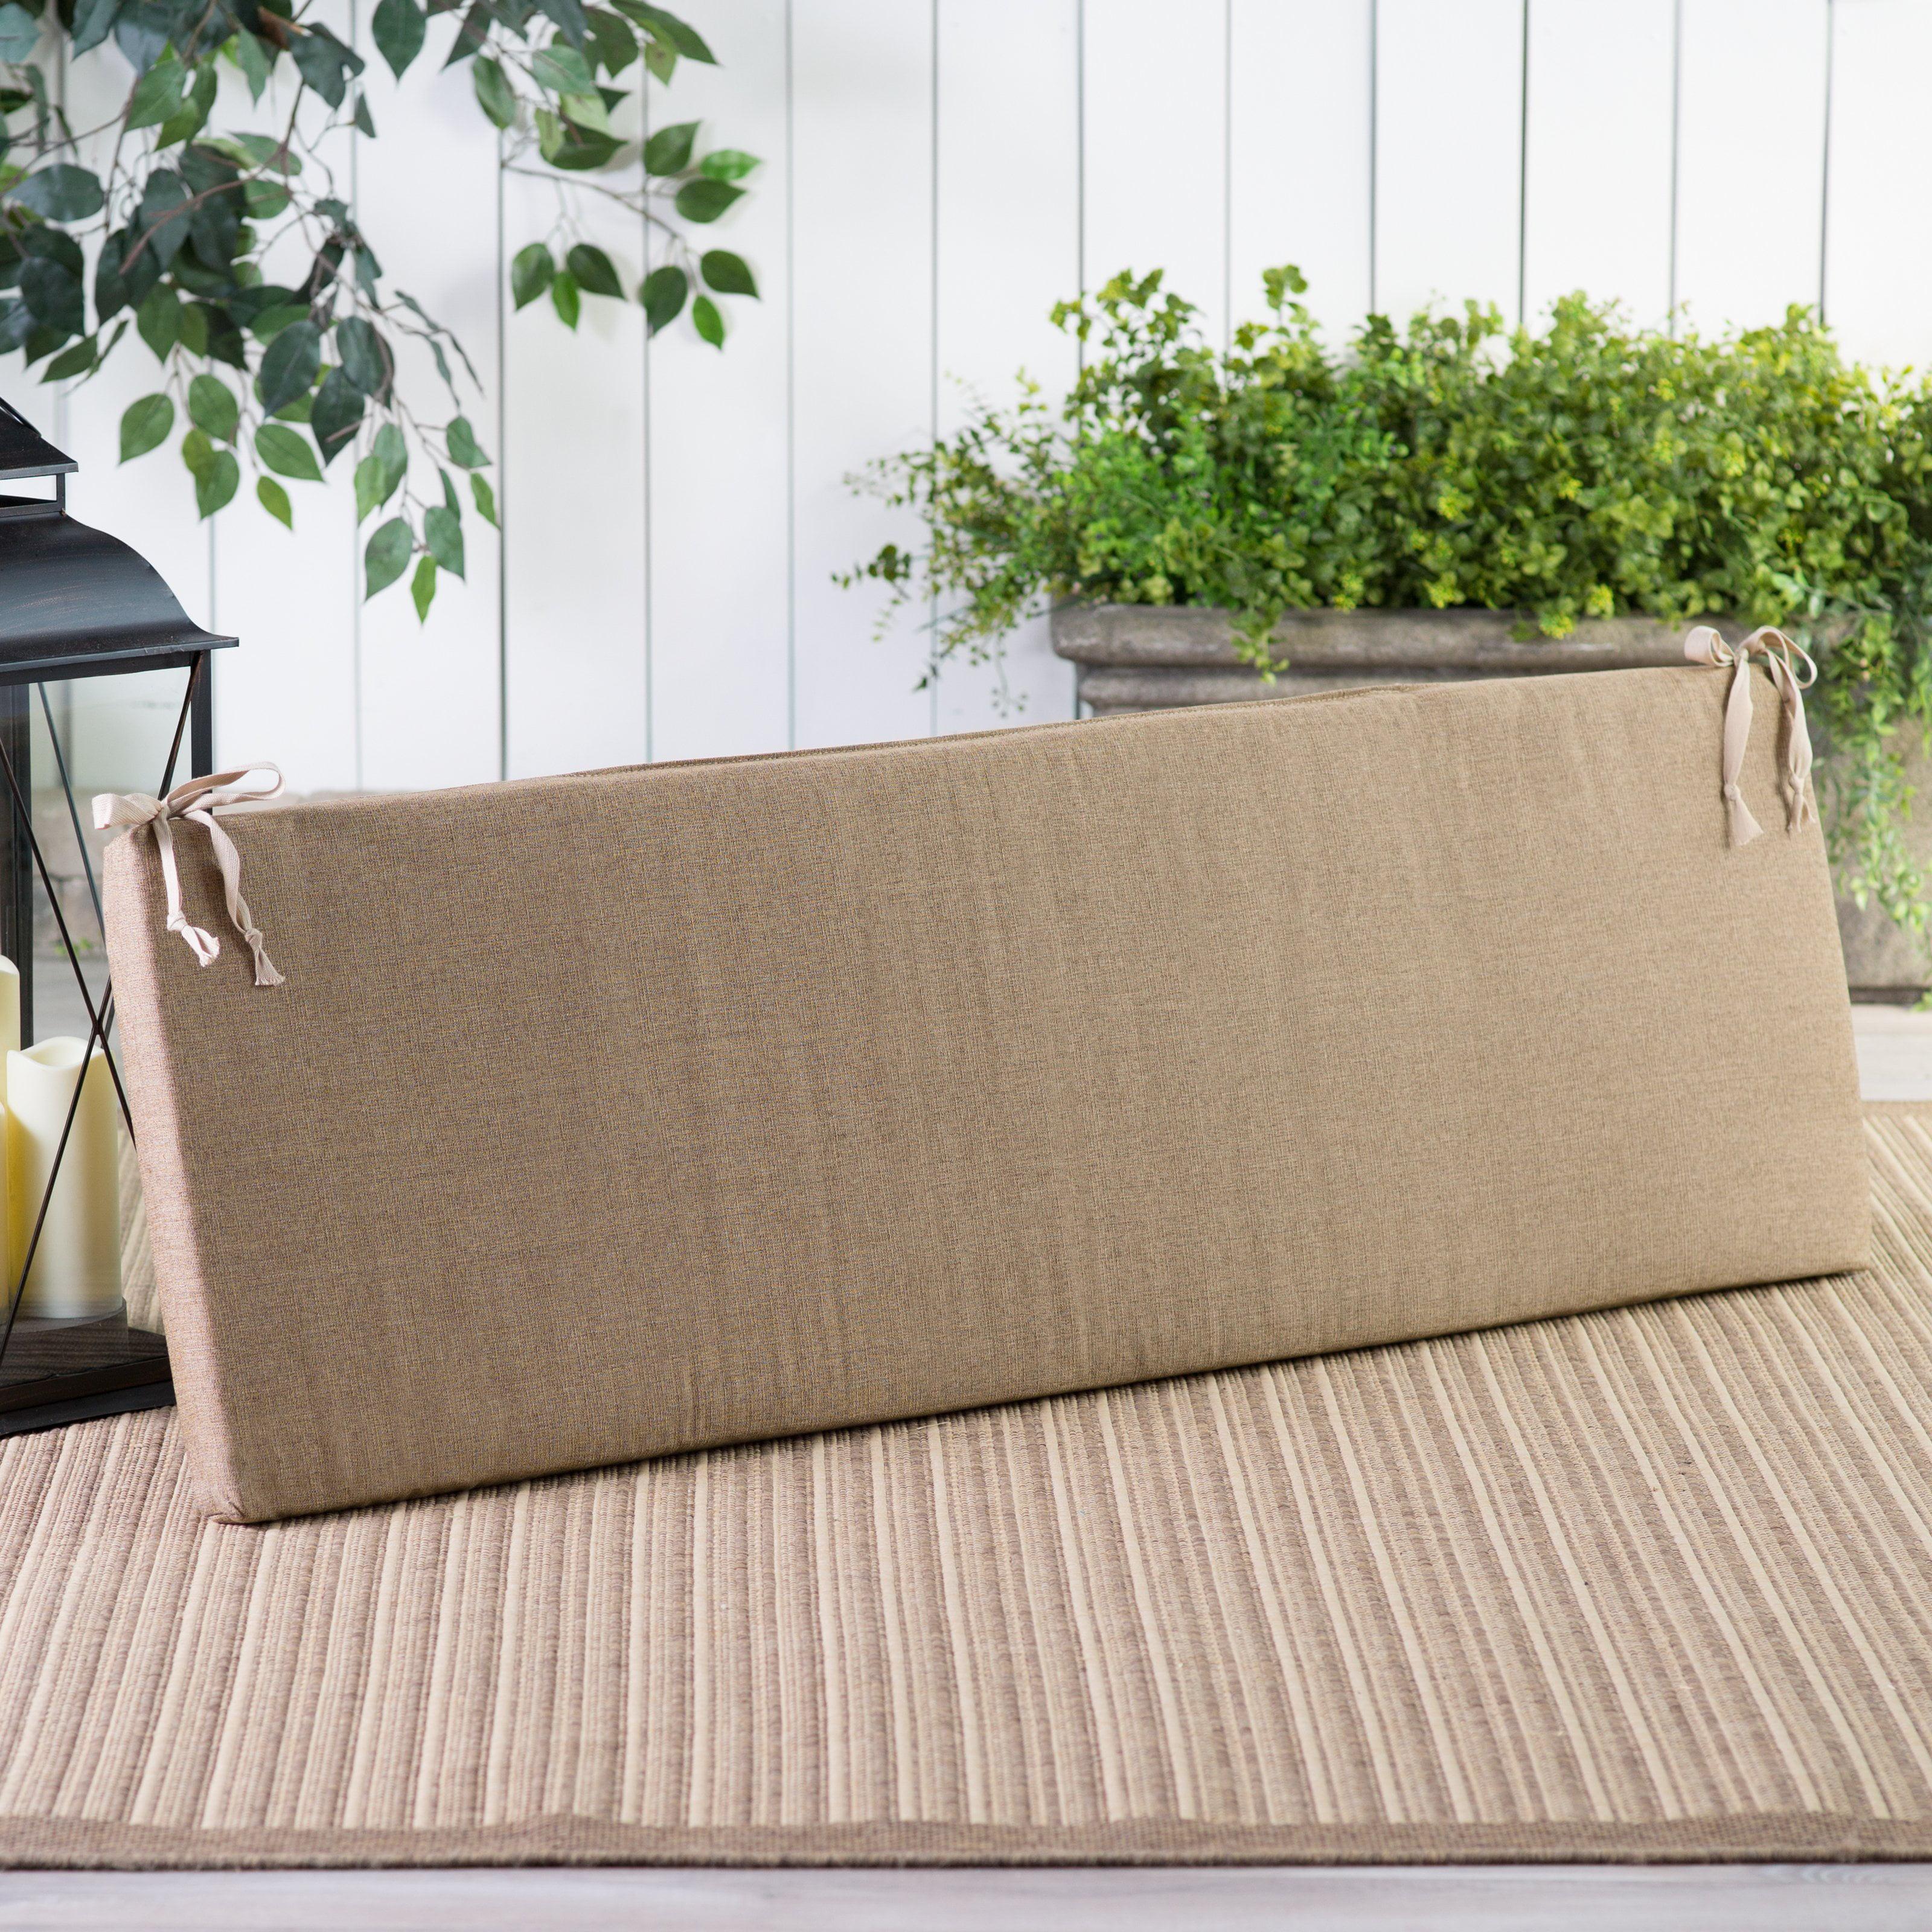 POLYWOOD® Sunbrella 56.5 x 17 in. Bench Cushion